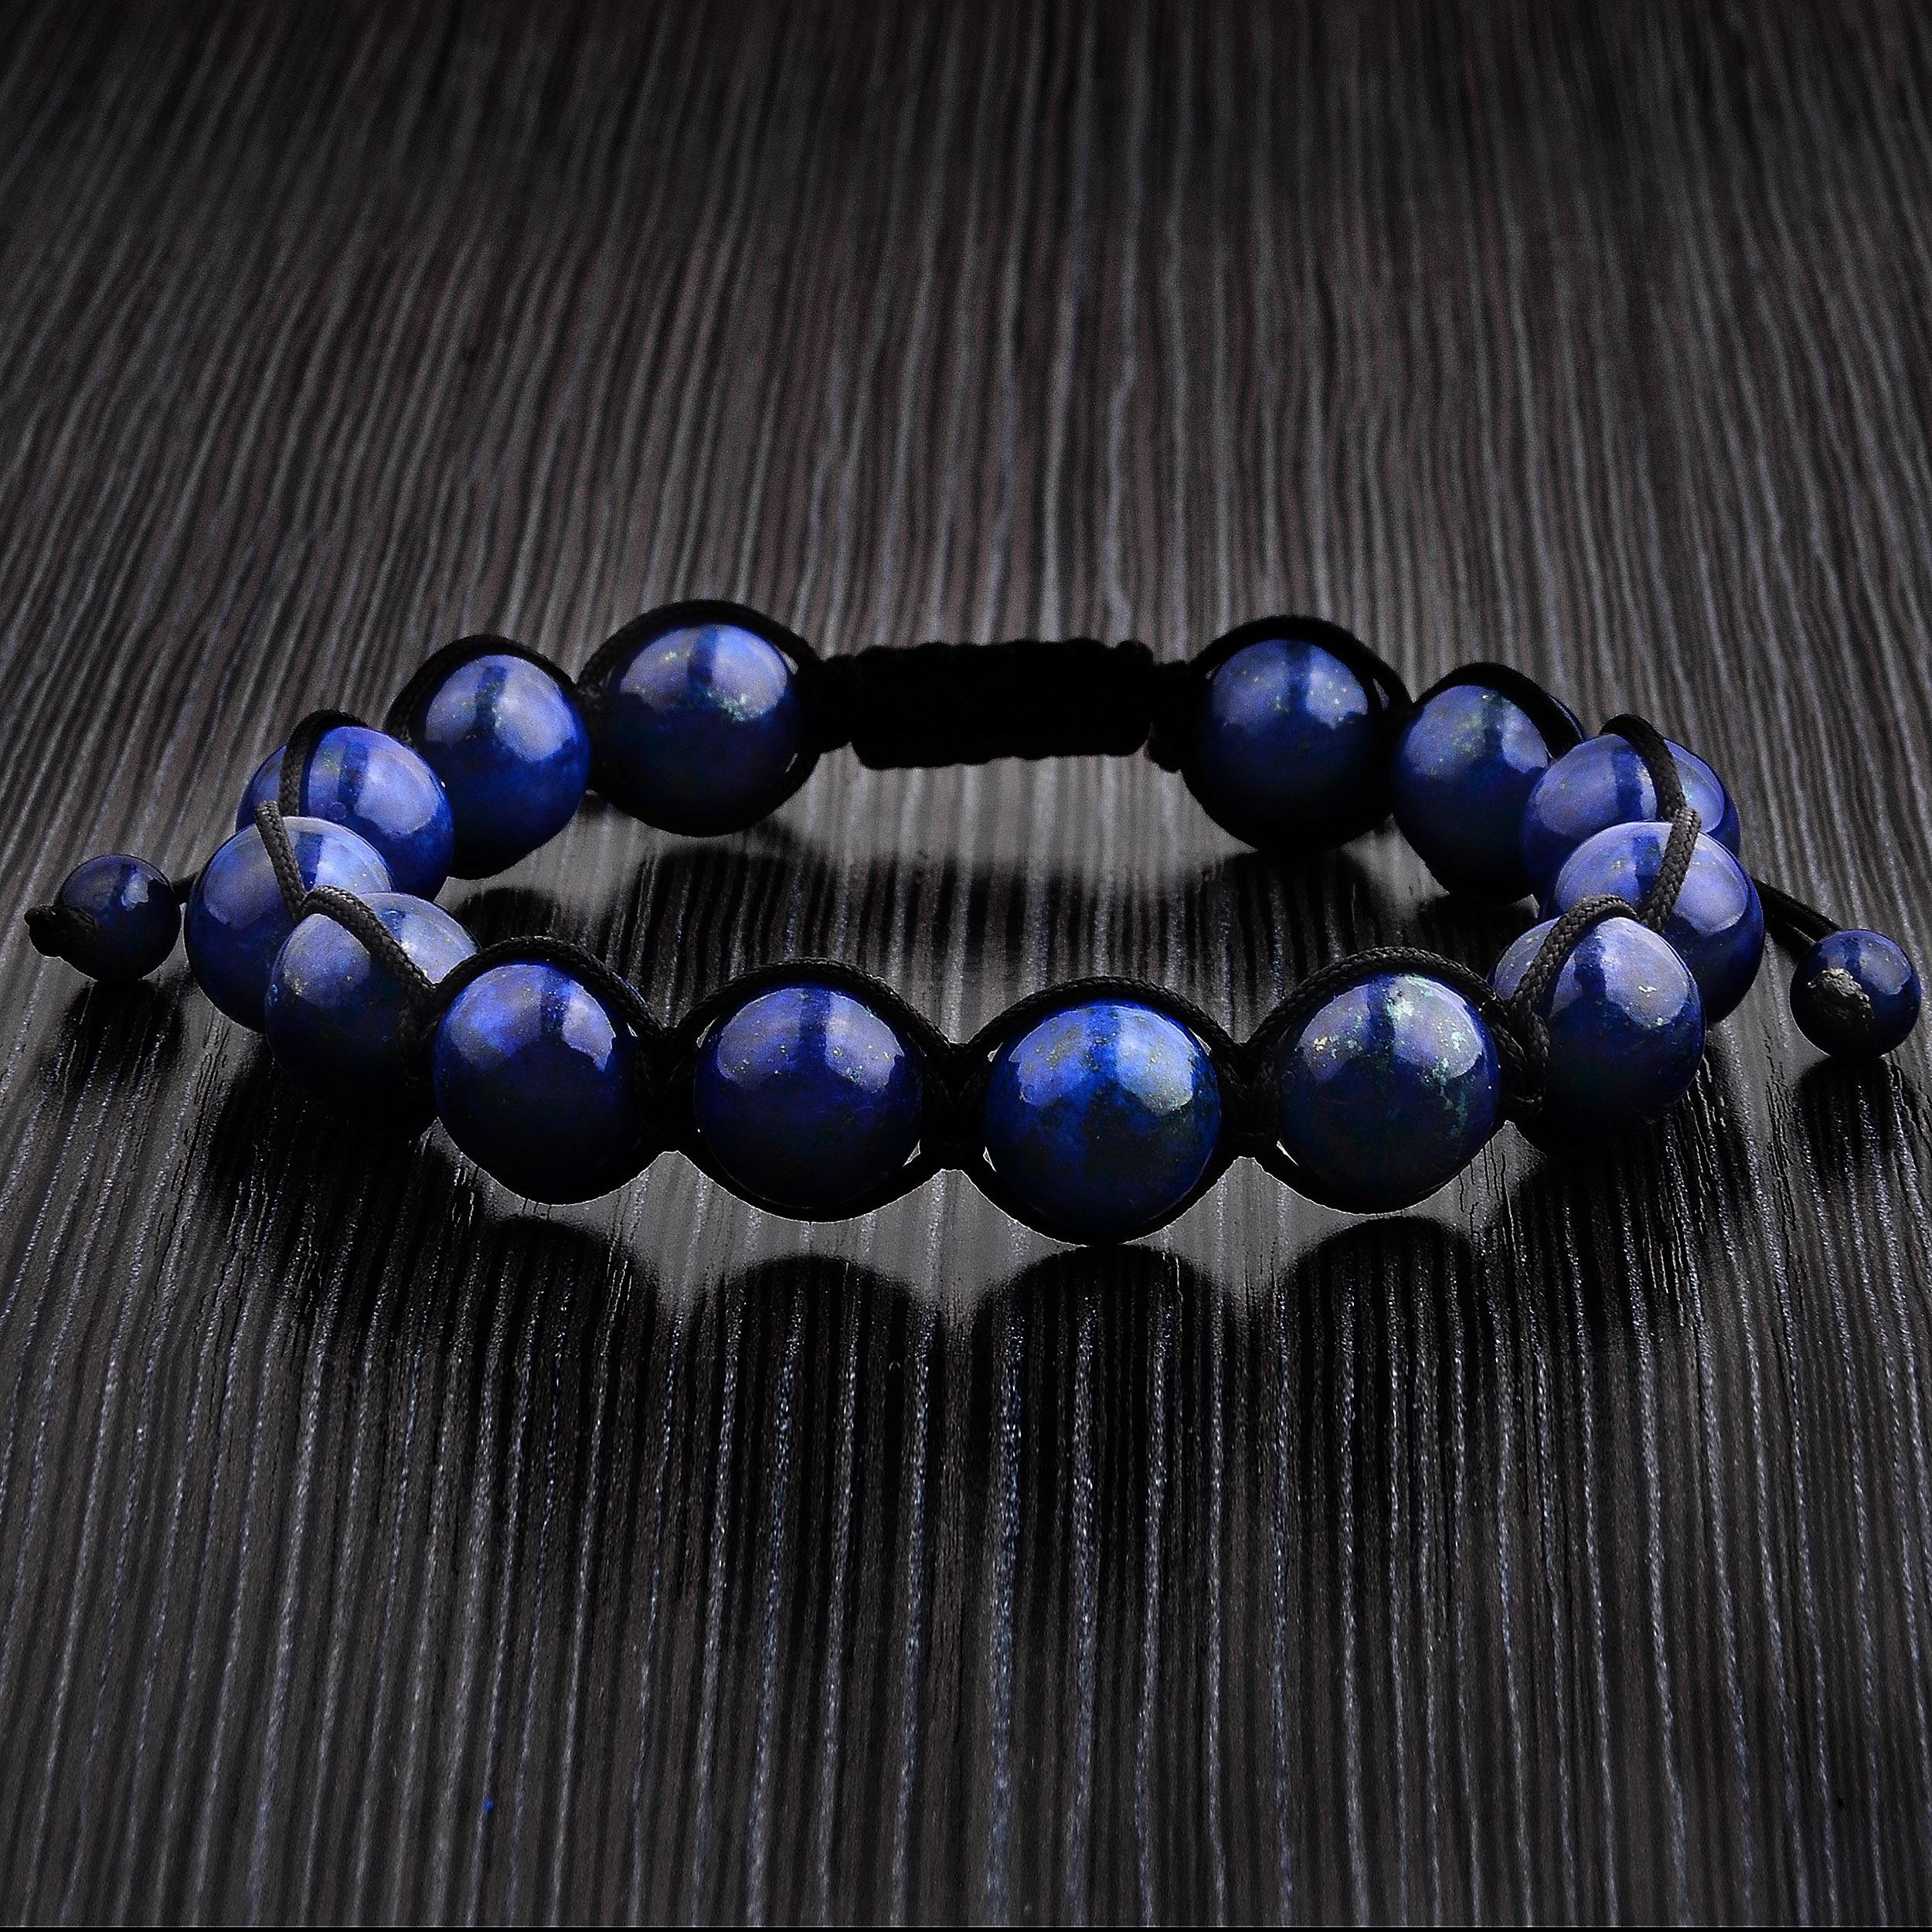 Lapis Lazuli Bracelet 10 mm Lazurite Bracelet Stretch Cord  Lazurite  Beaded Bracelet Natural Mineral Bracelet Gift For Her Blue Bracelet